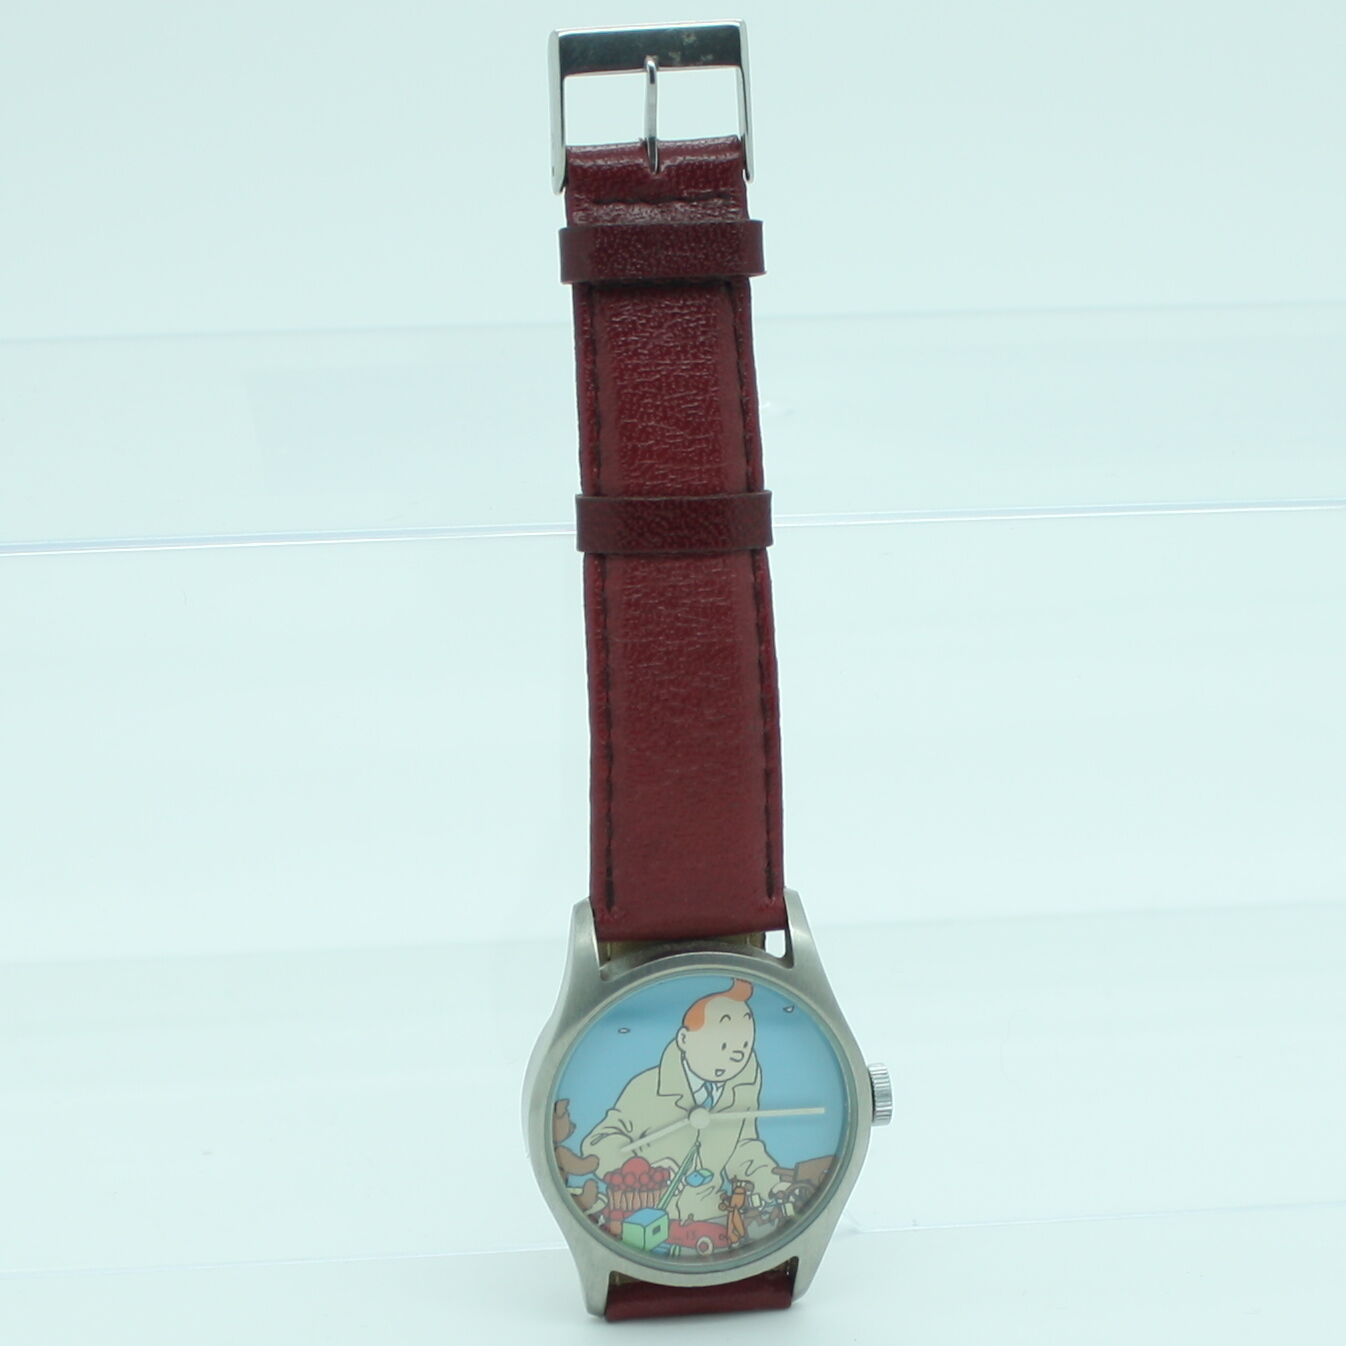 TINTIN MOULINSART HERGE Montre Horloge orologio - 82073 Jouets Bordeaux OK